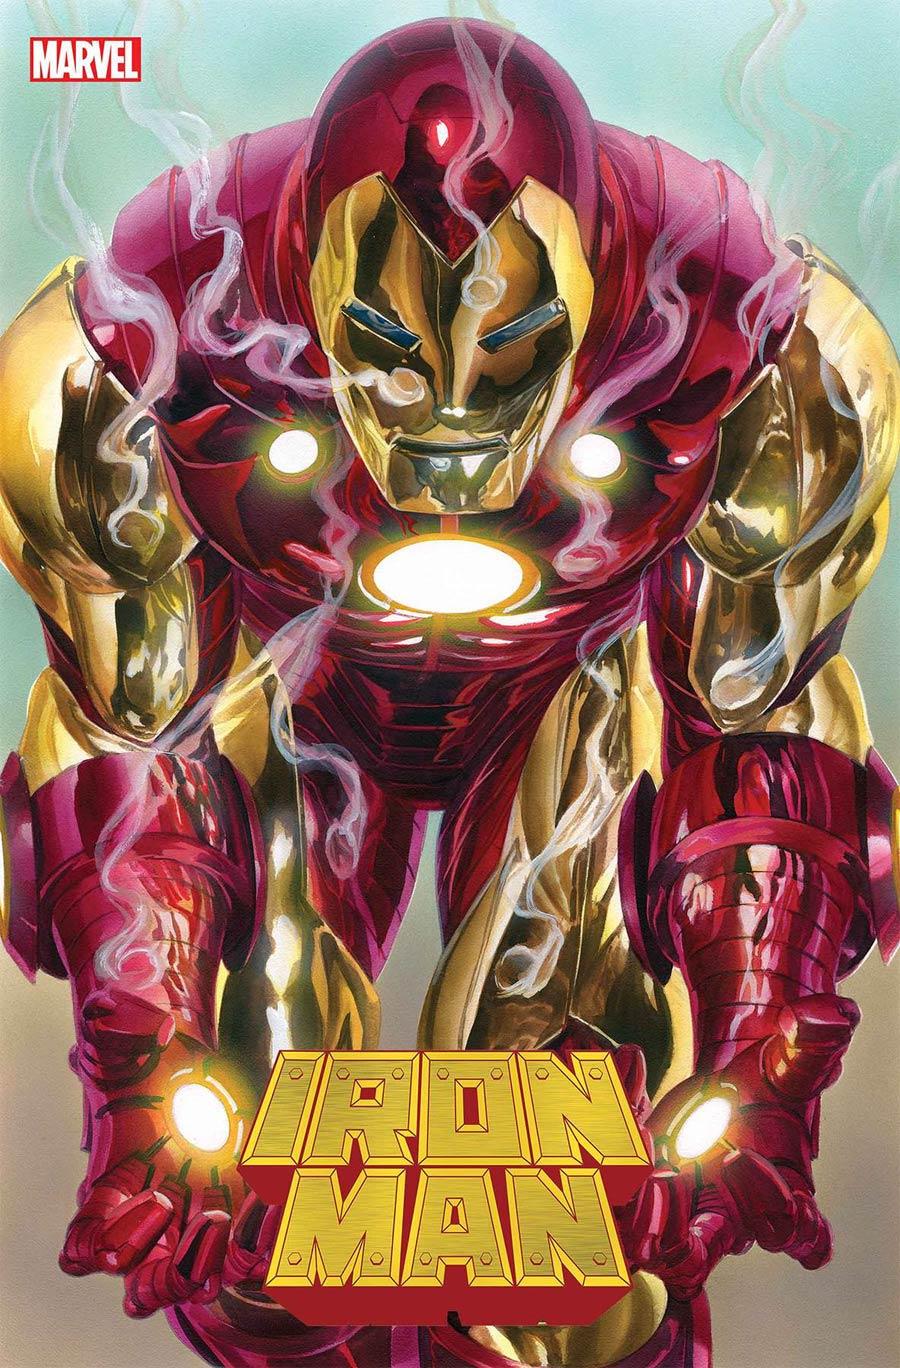 Iron Man Vol 6 #2 Cover A Regular Alex Ross Cover